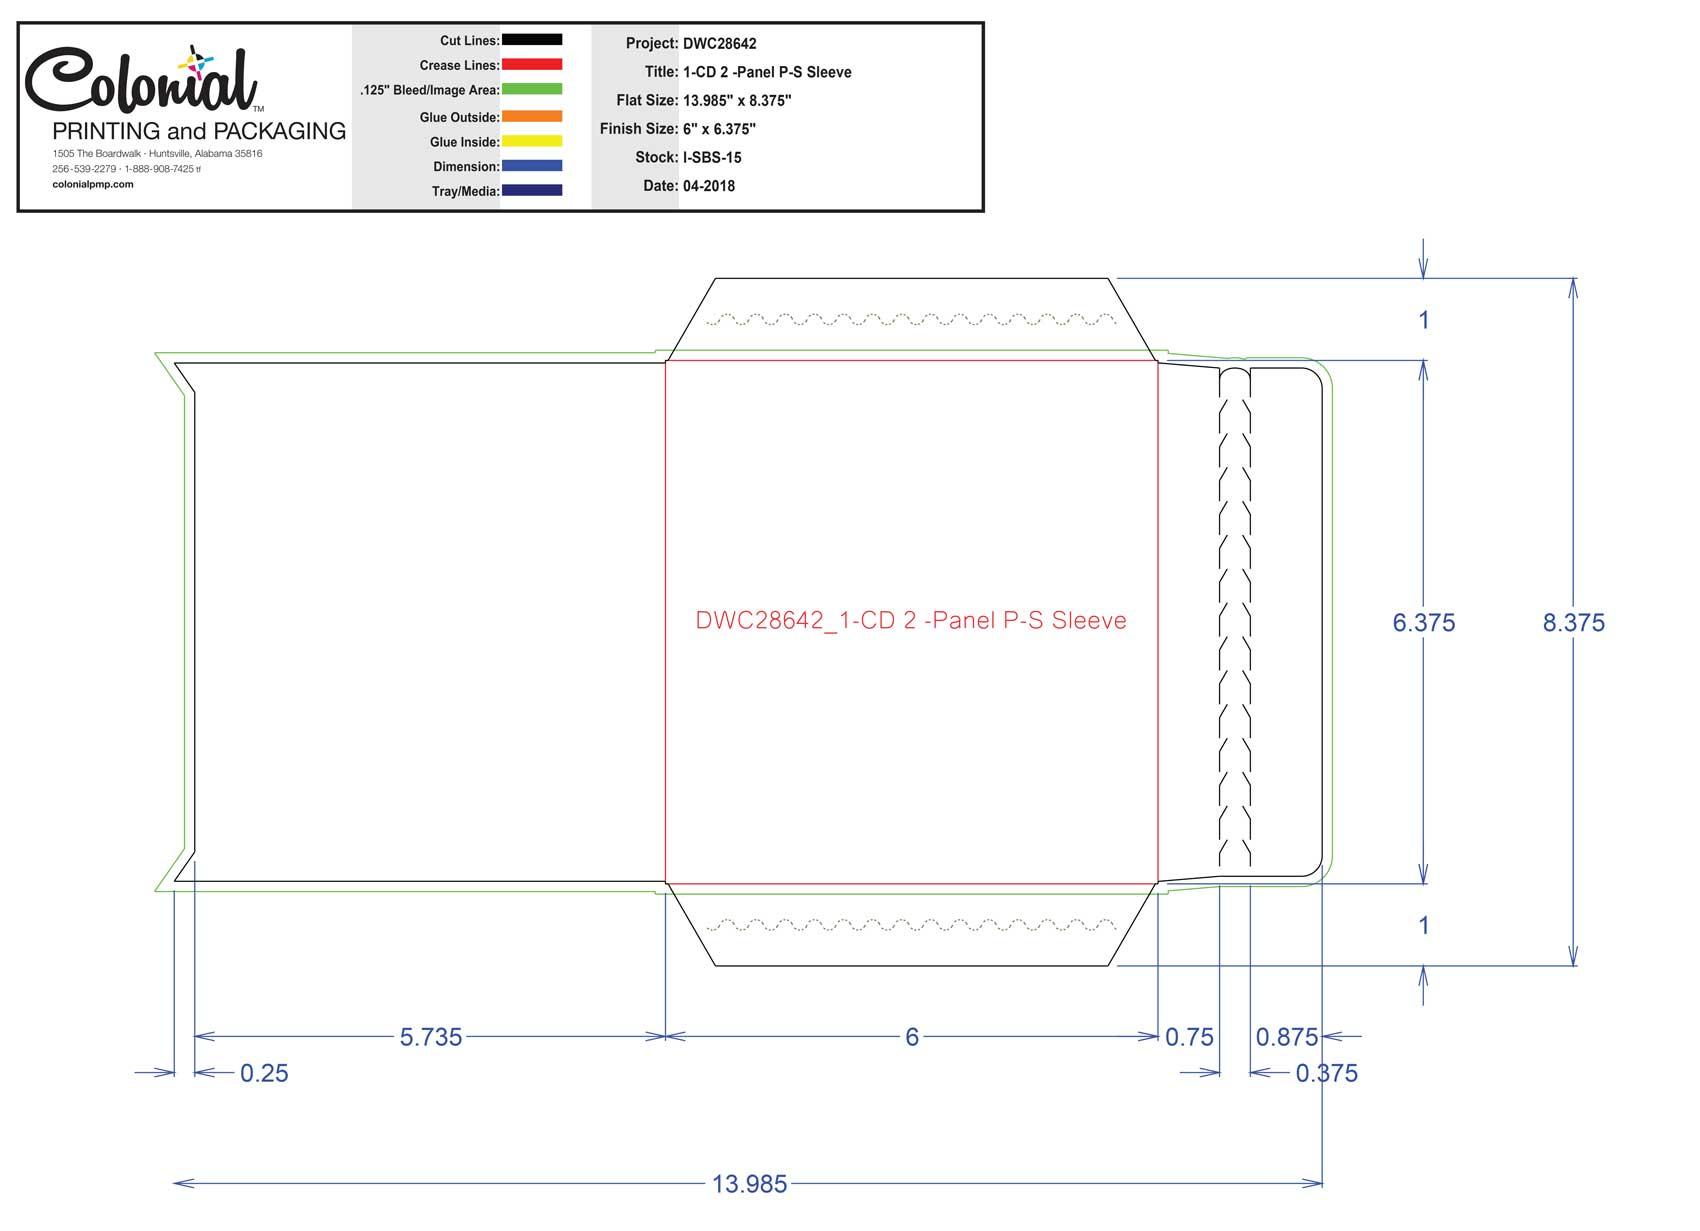 DWC28642_1-CD 2 -Panel P-S Sleeve